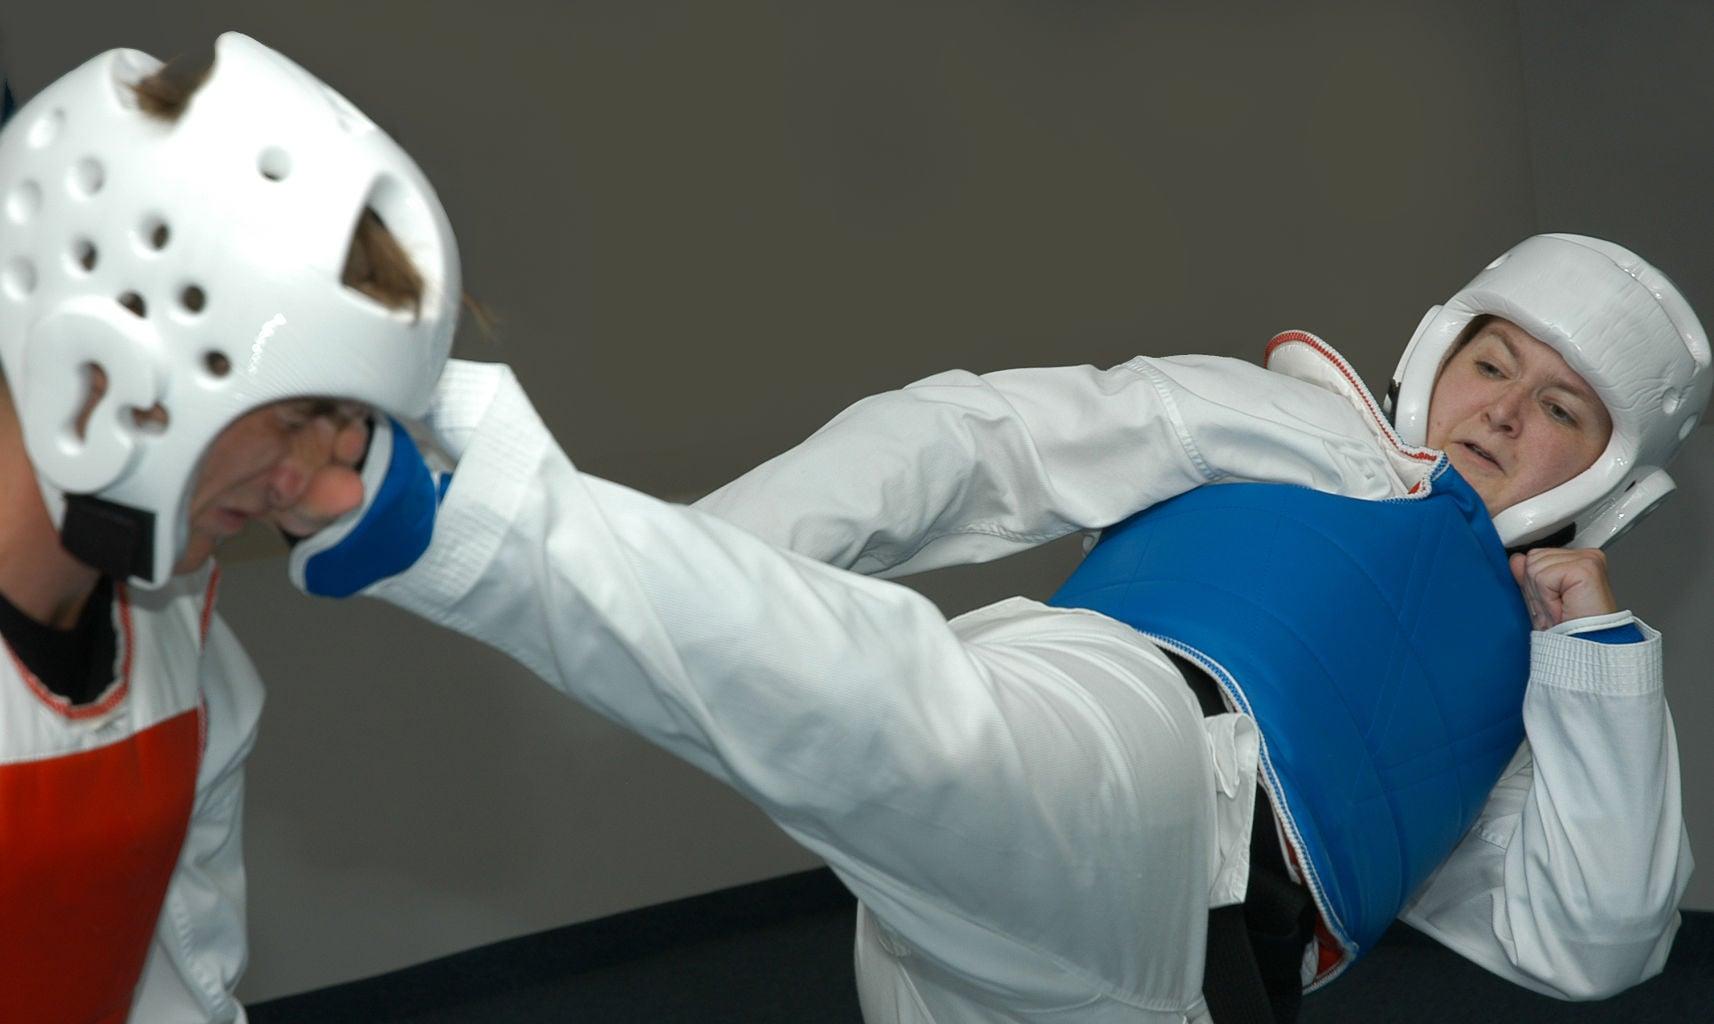 Taekwondo Club St Gely Fesc